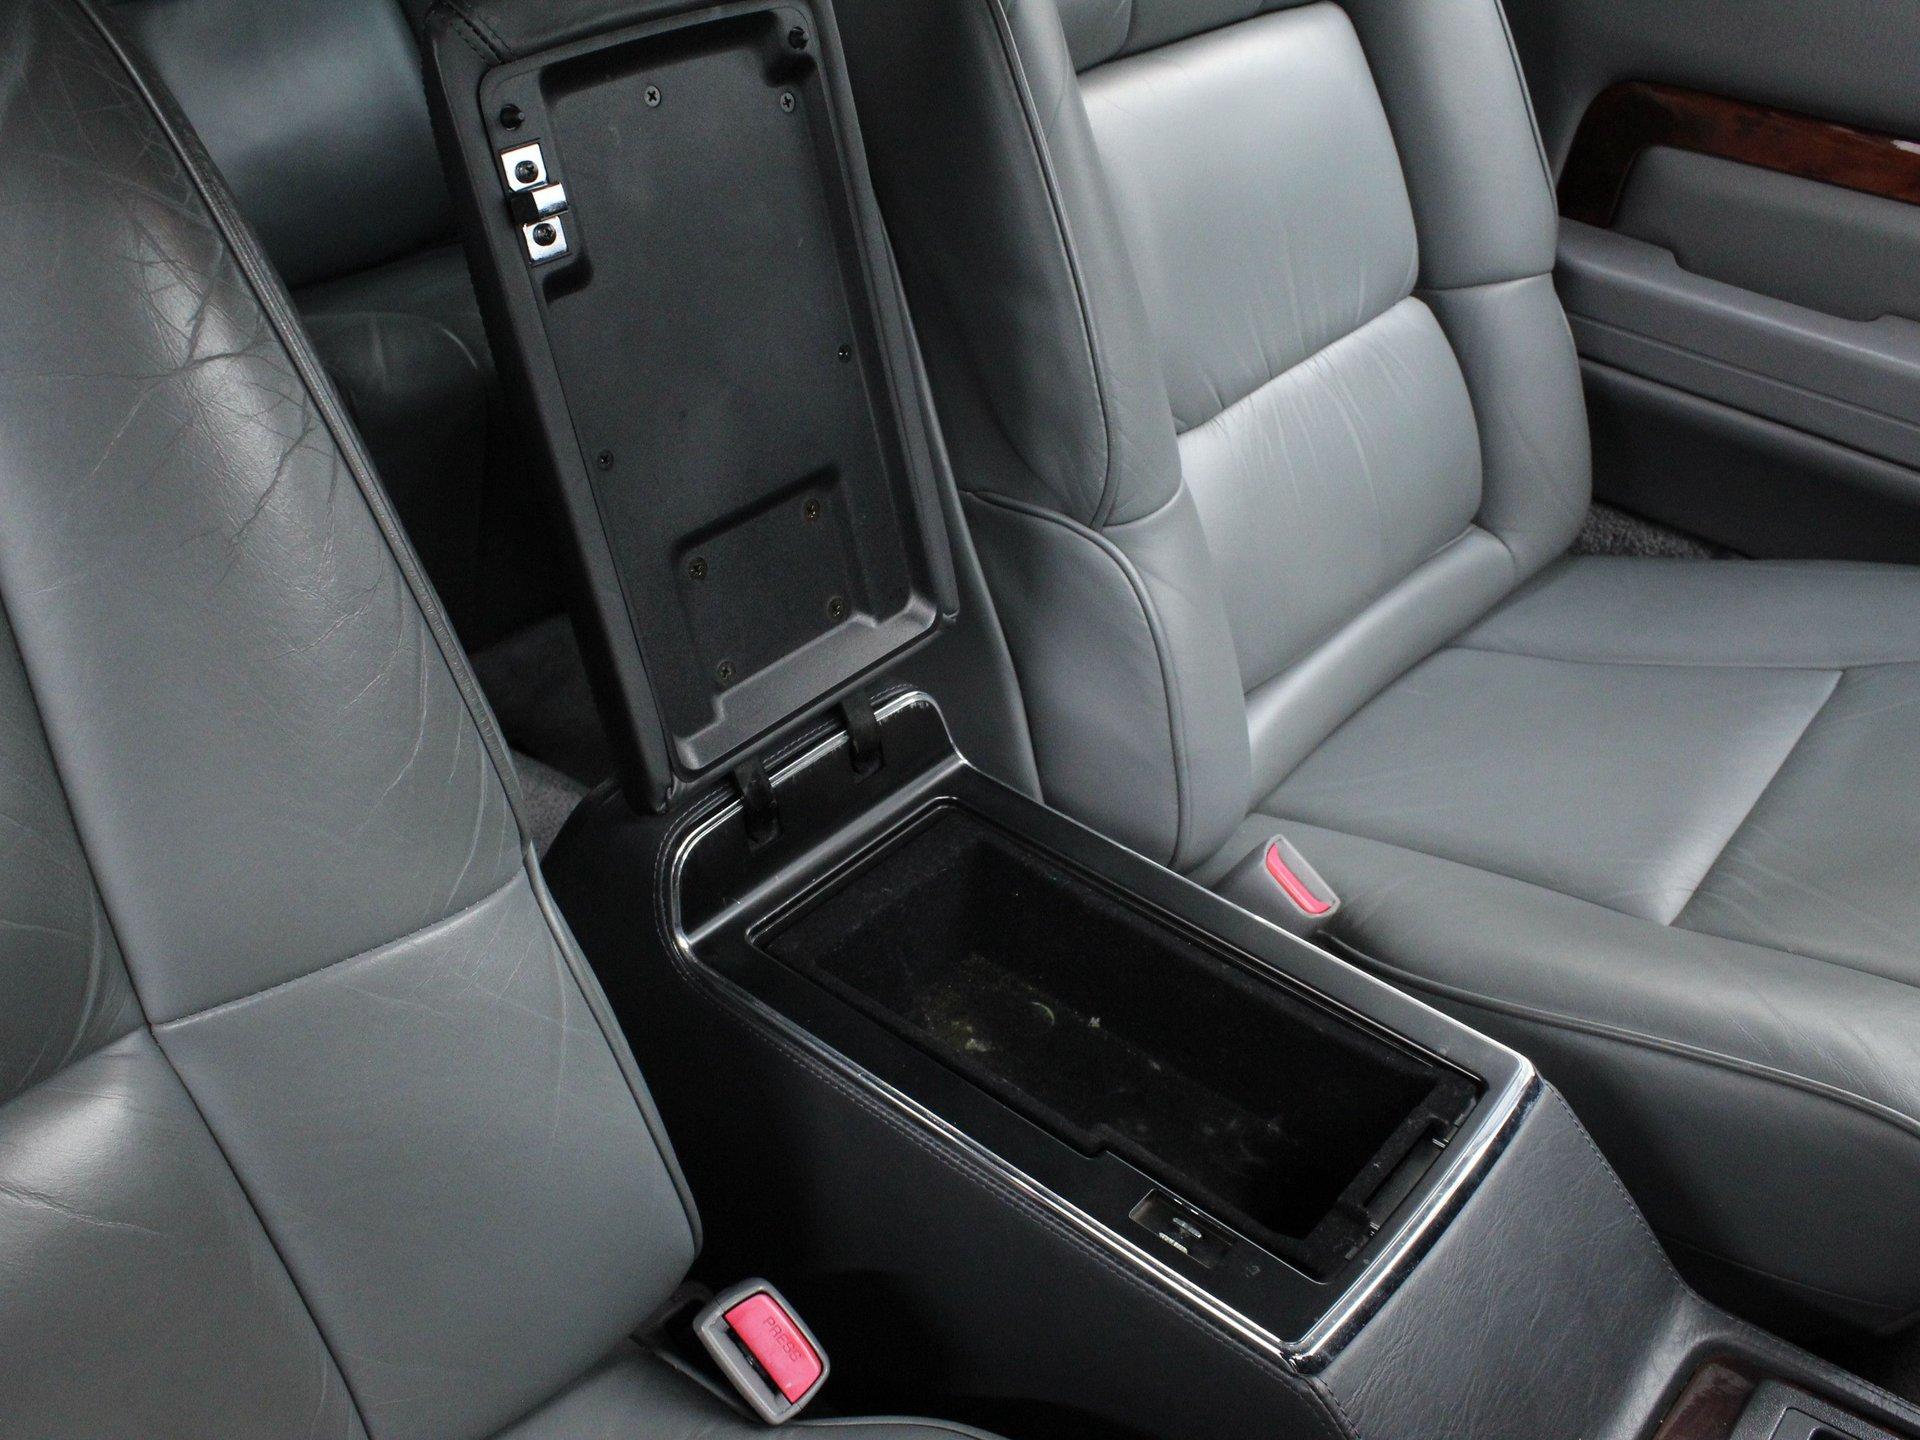 1993 Toyota Century